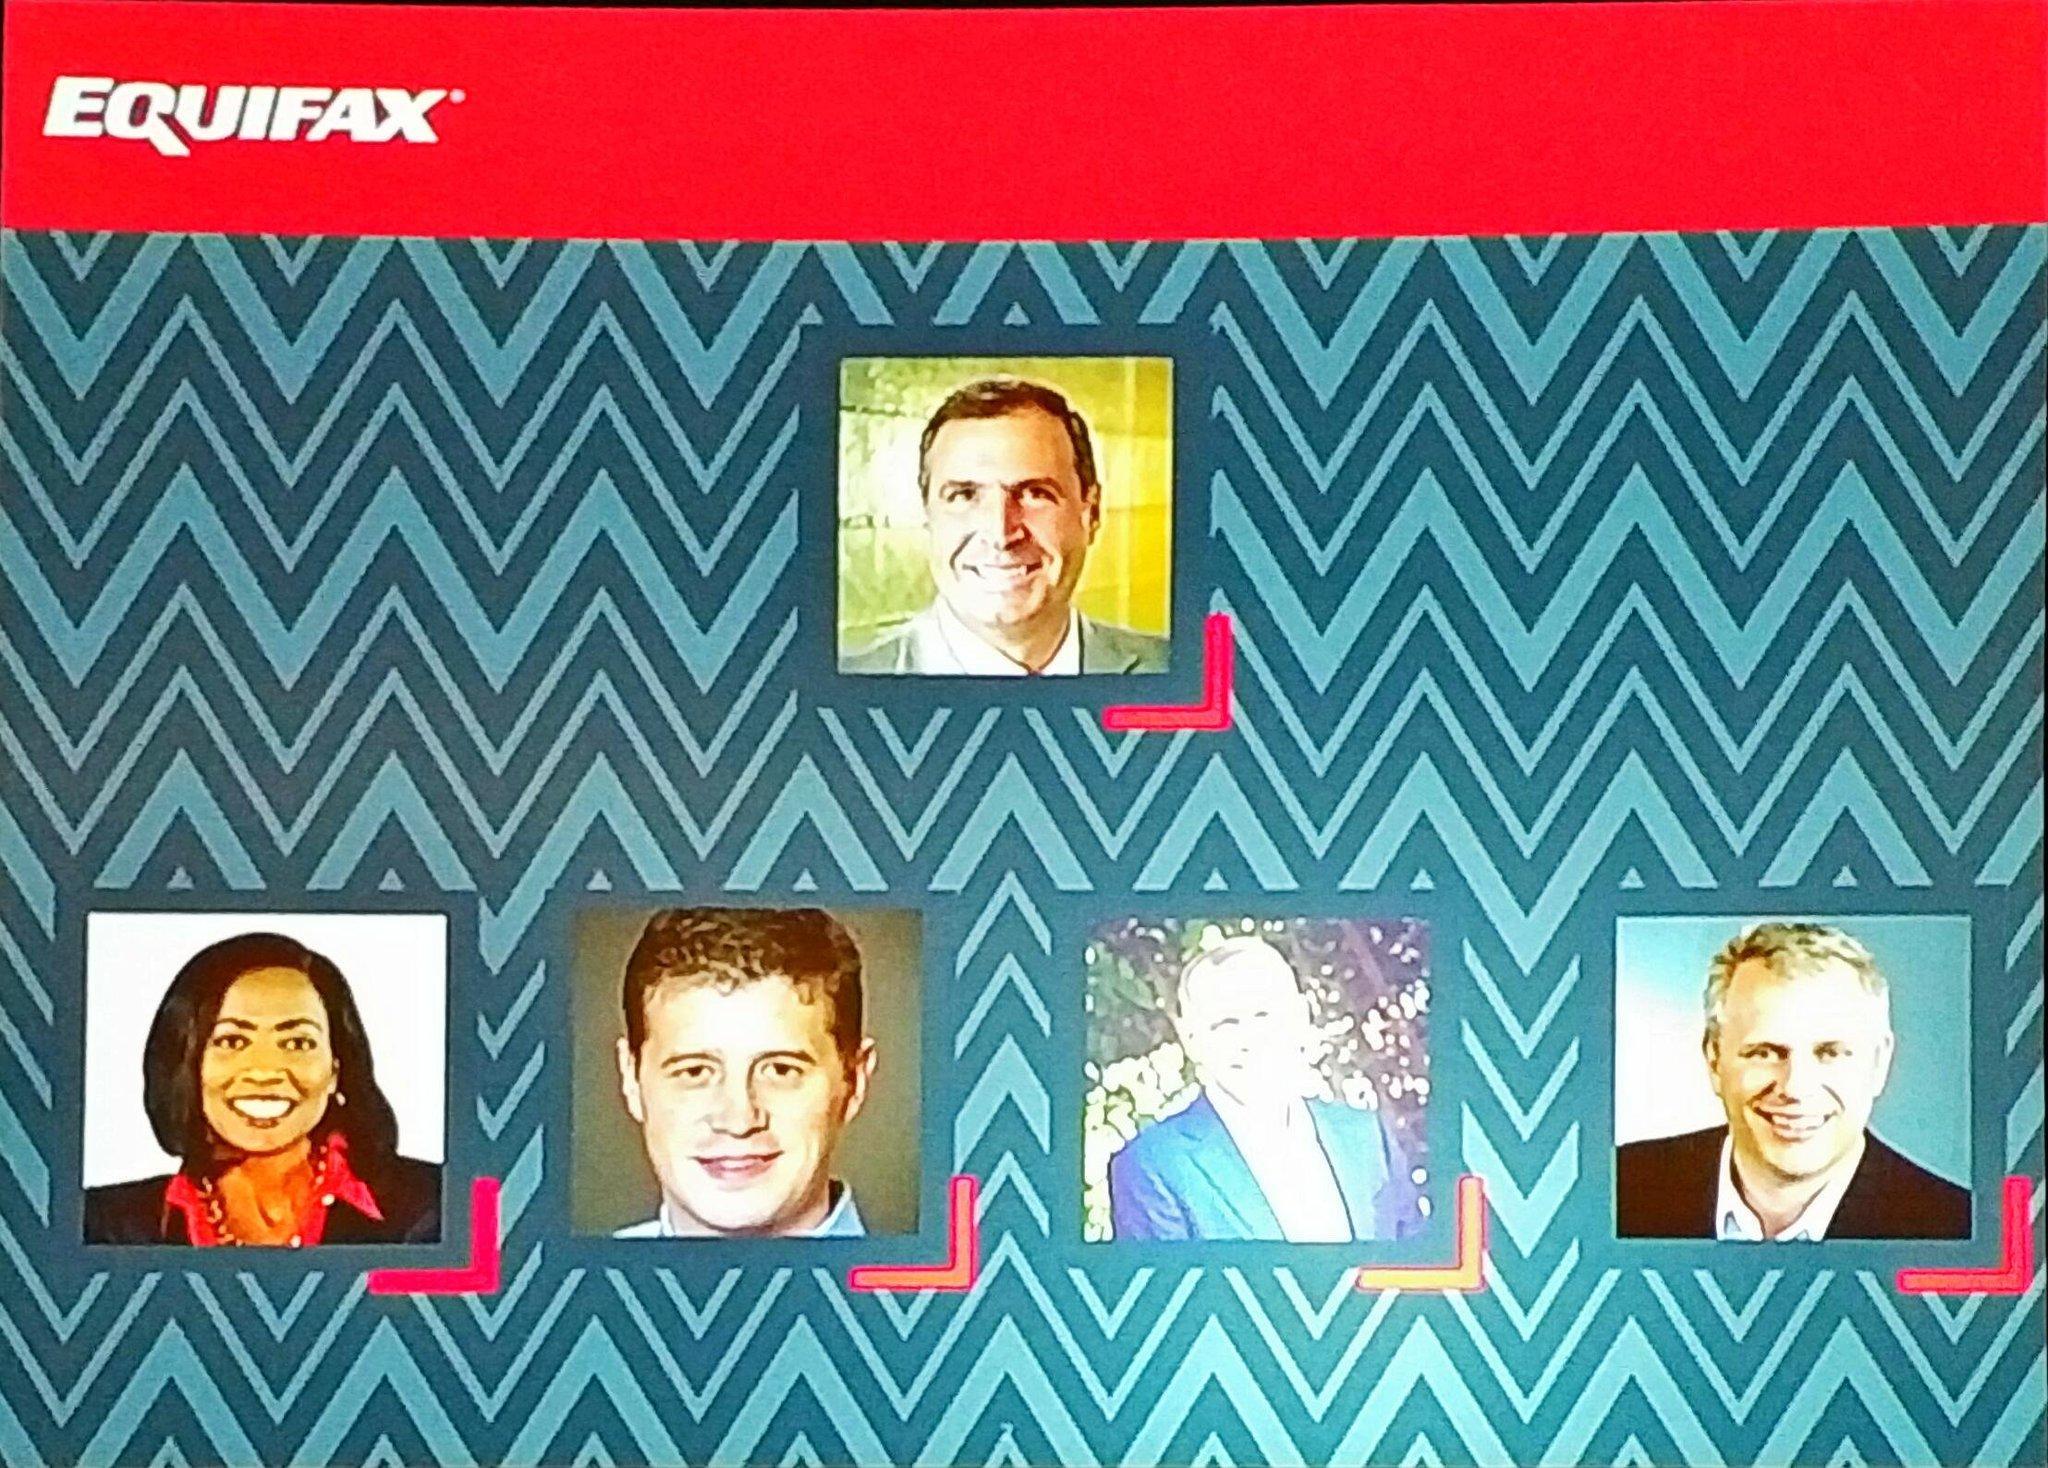 Looking @EquifaxInsights Leadership Team #EFXForum17 https://t.co/v0xpAIa2qW